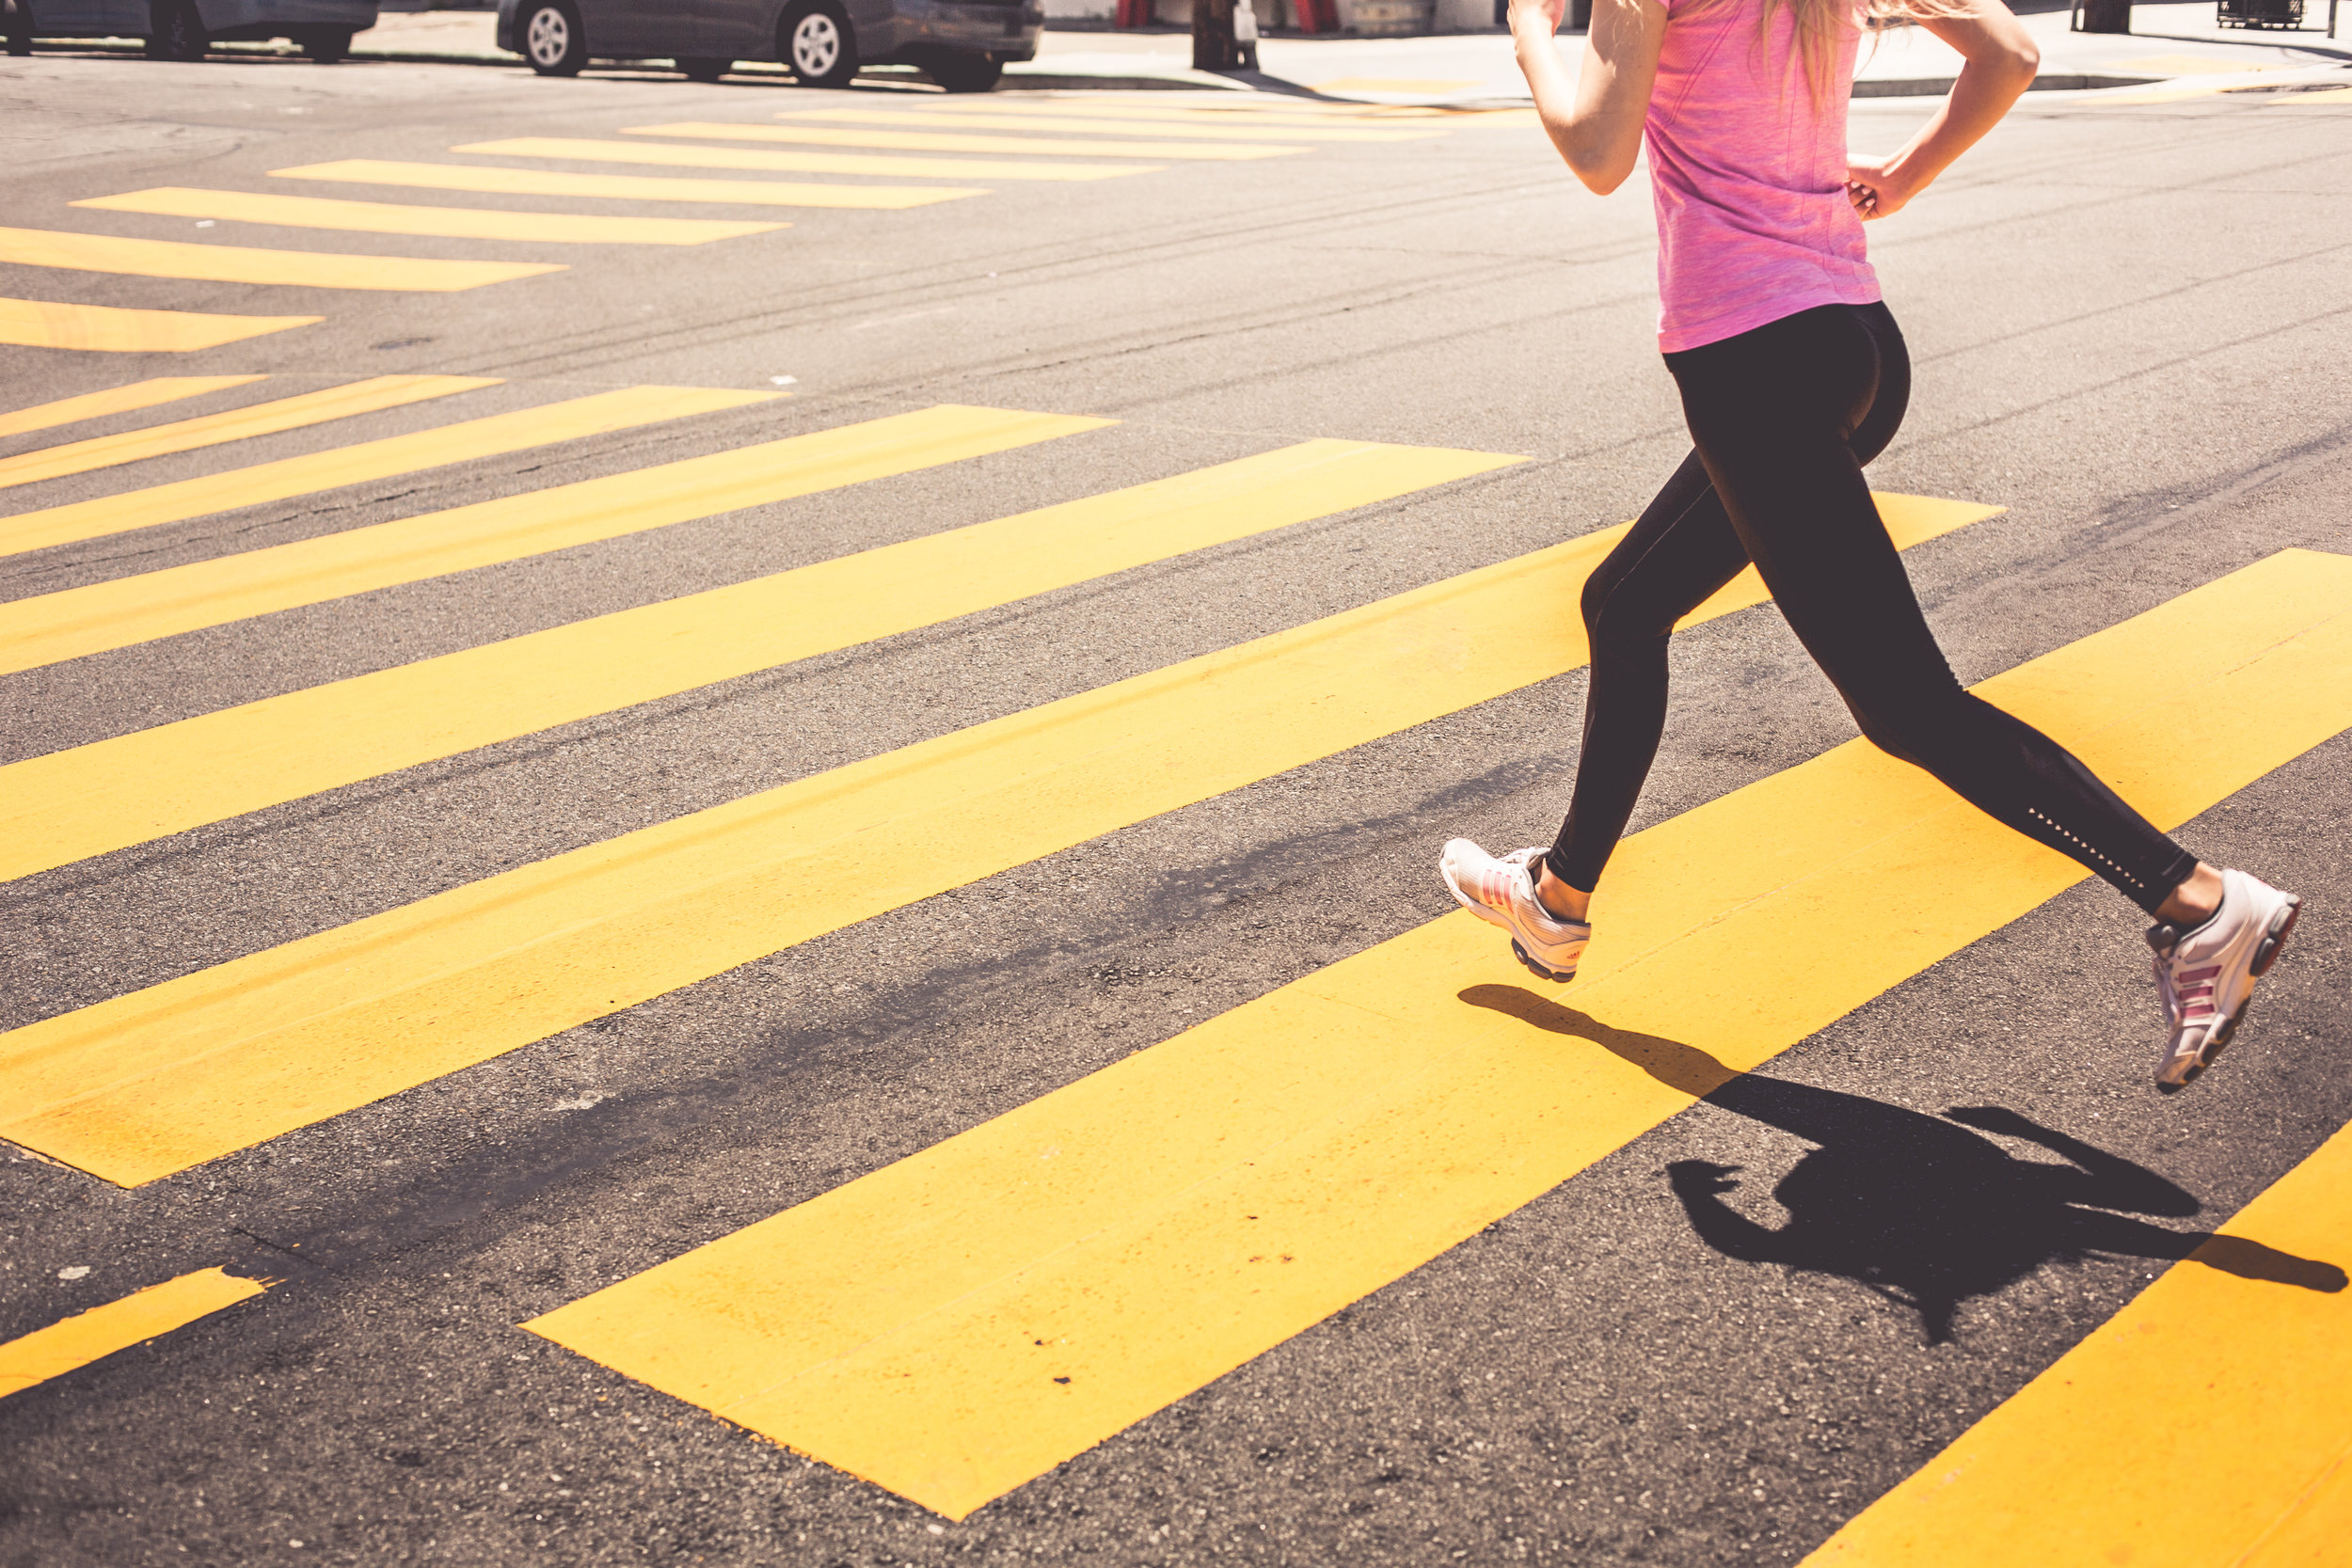 blonde-woman-running-over-the-pedestrian-crossing-picjumbo-com.jpg